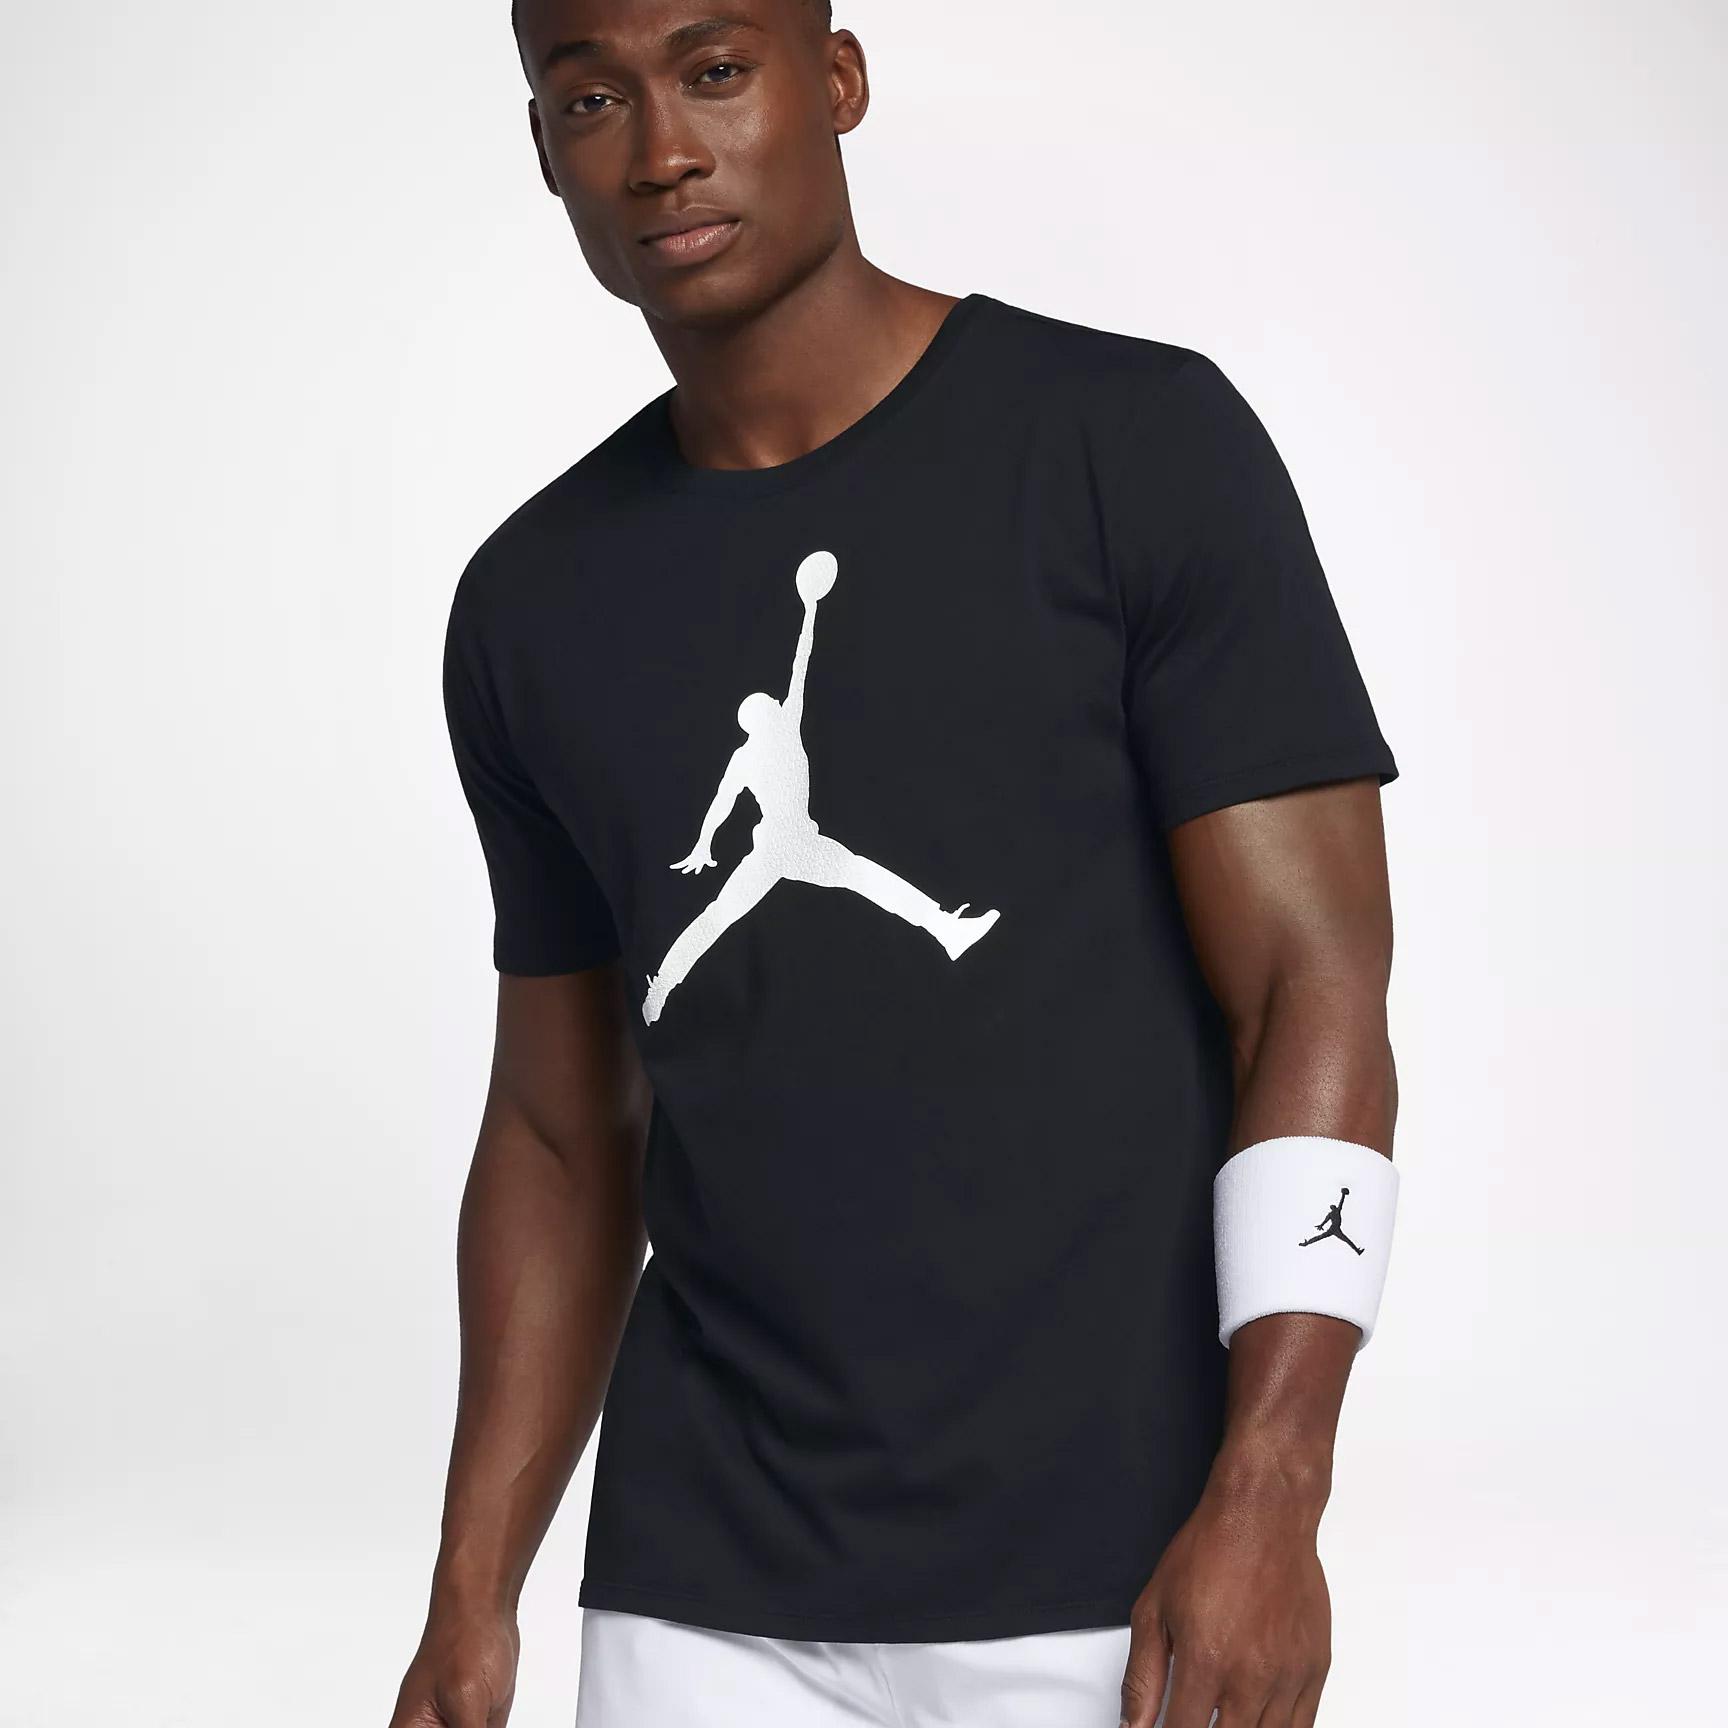 69dcb5095b247 Nike M JSW TEE ICONIC JUMPMAN. Pánské tričko Jordan. Pánské tričko Jordan